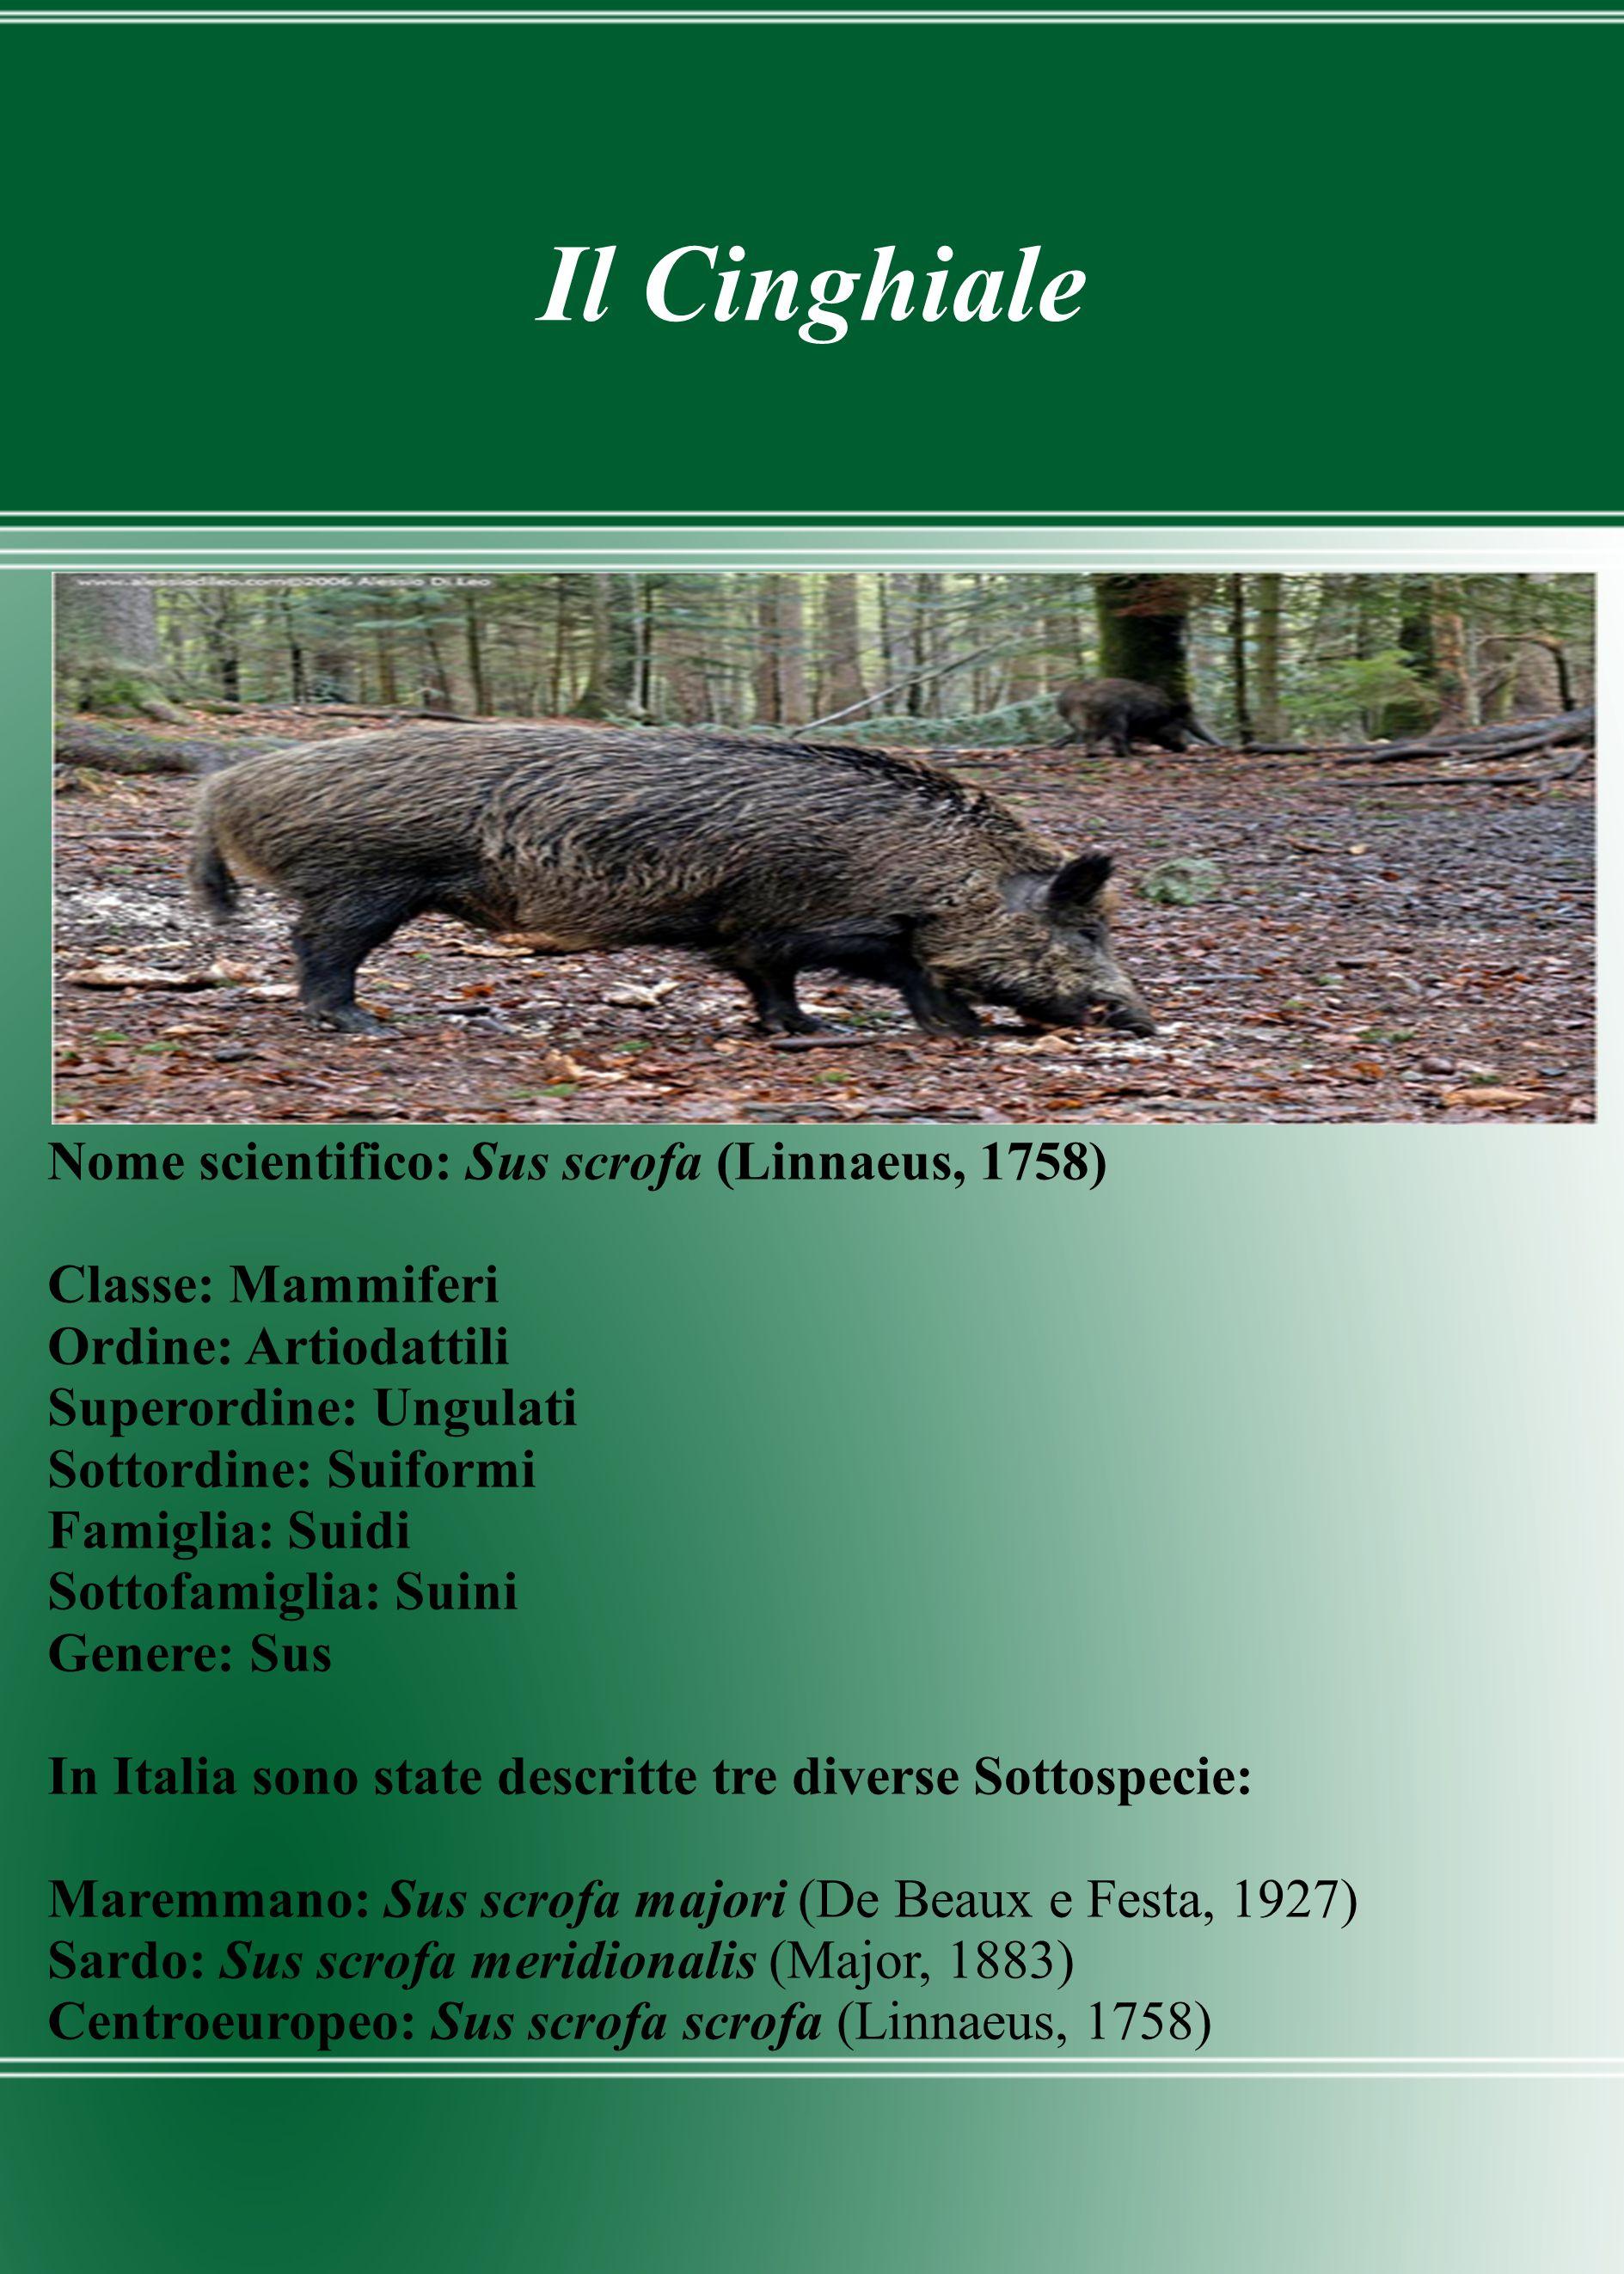 Il Cinghiale Nome scientifico: Sus scrofa (Linnaeus, 1758) Classe: Mammiferi Ordine: Artiodattili Superordine: Ungulati Sottordine: Suiformi Famiglia: